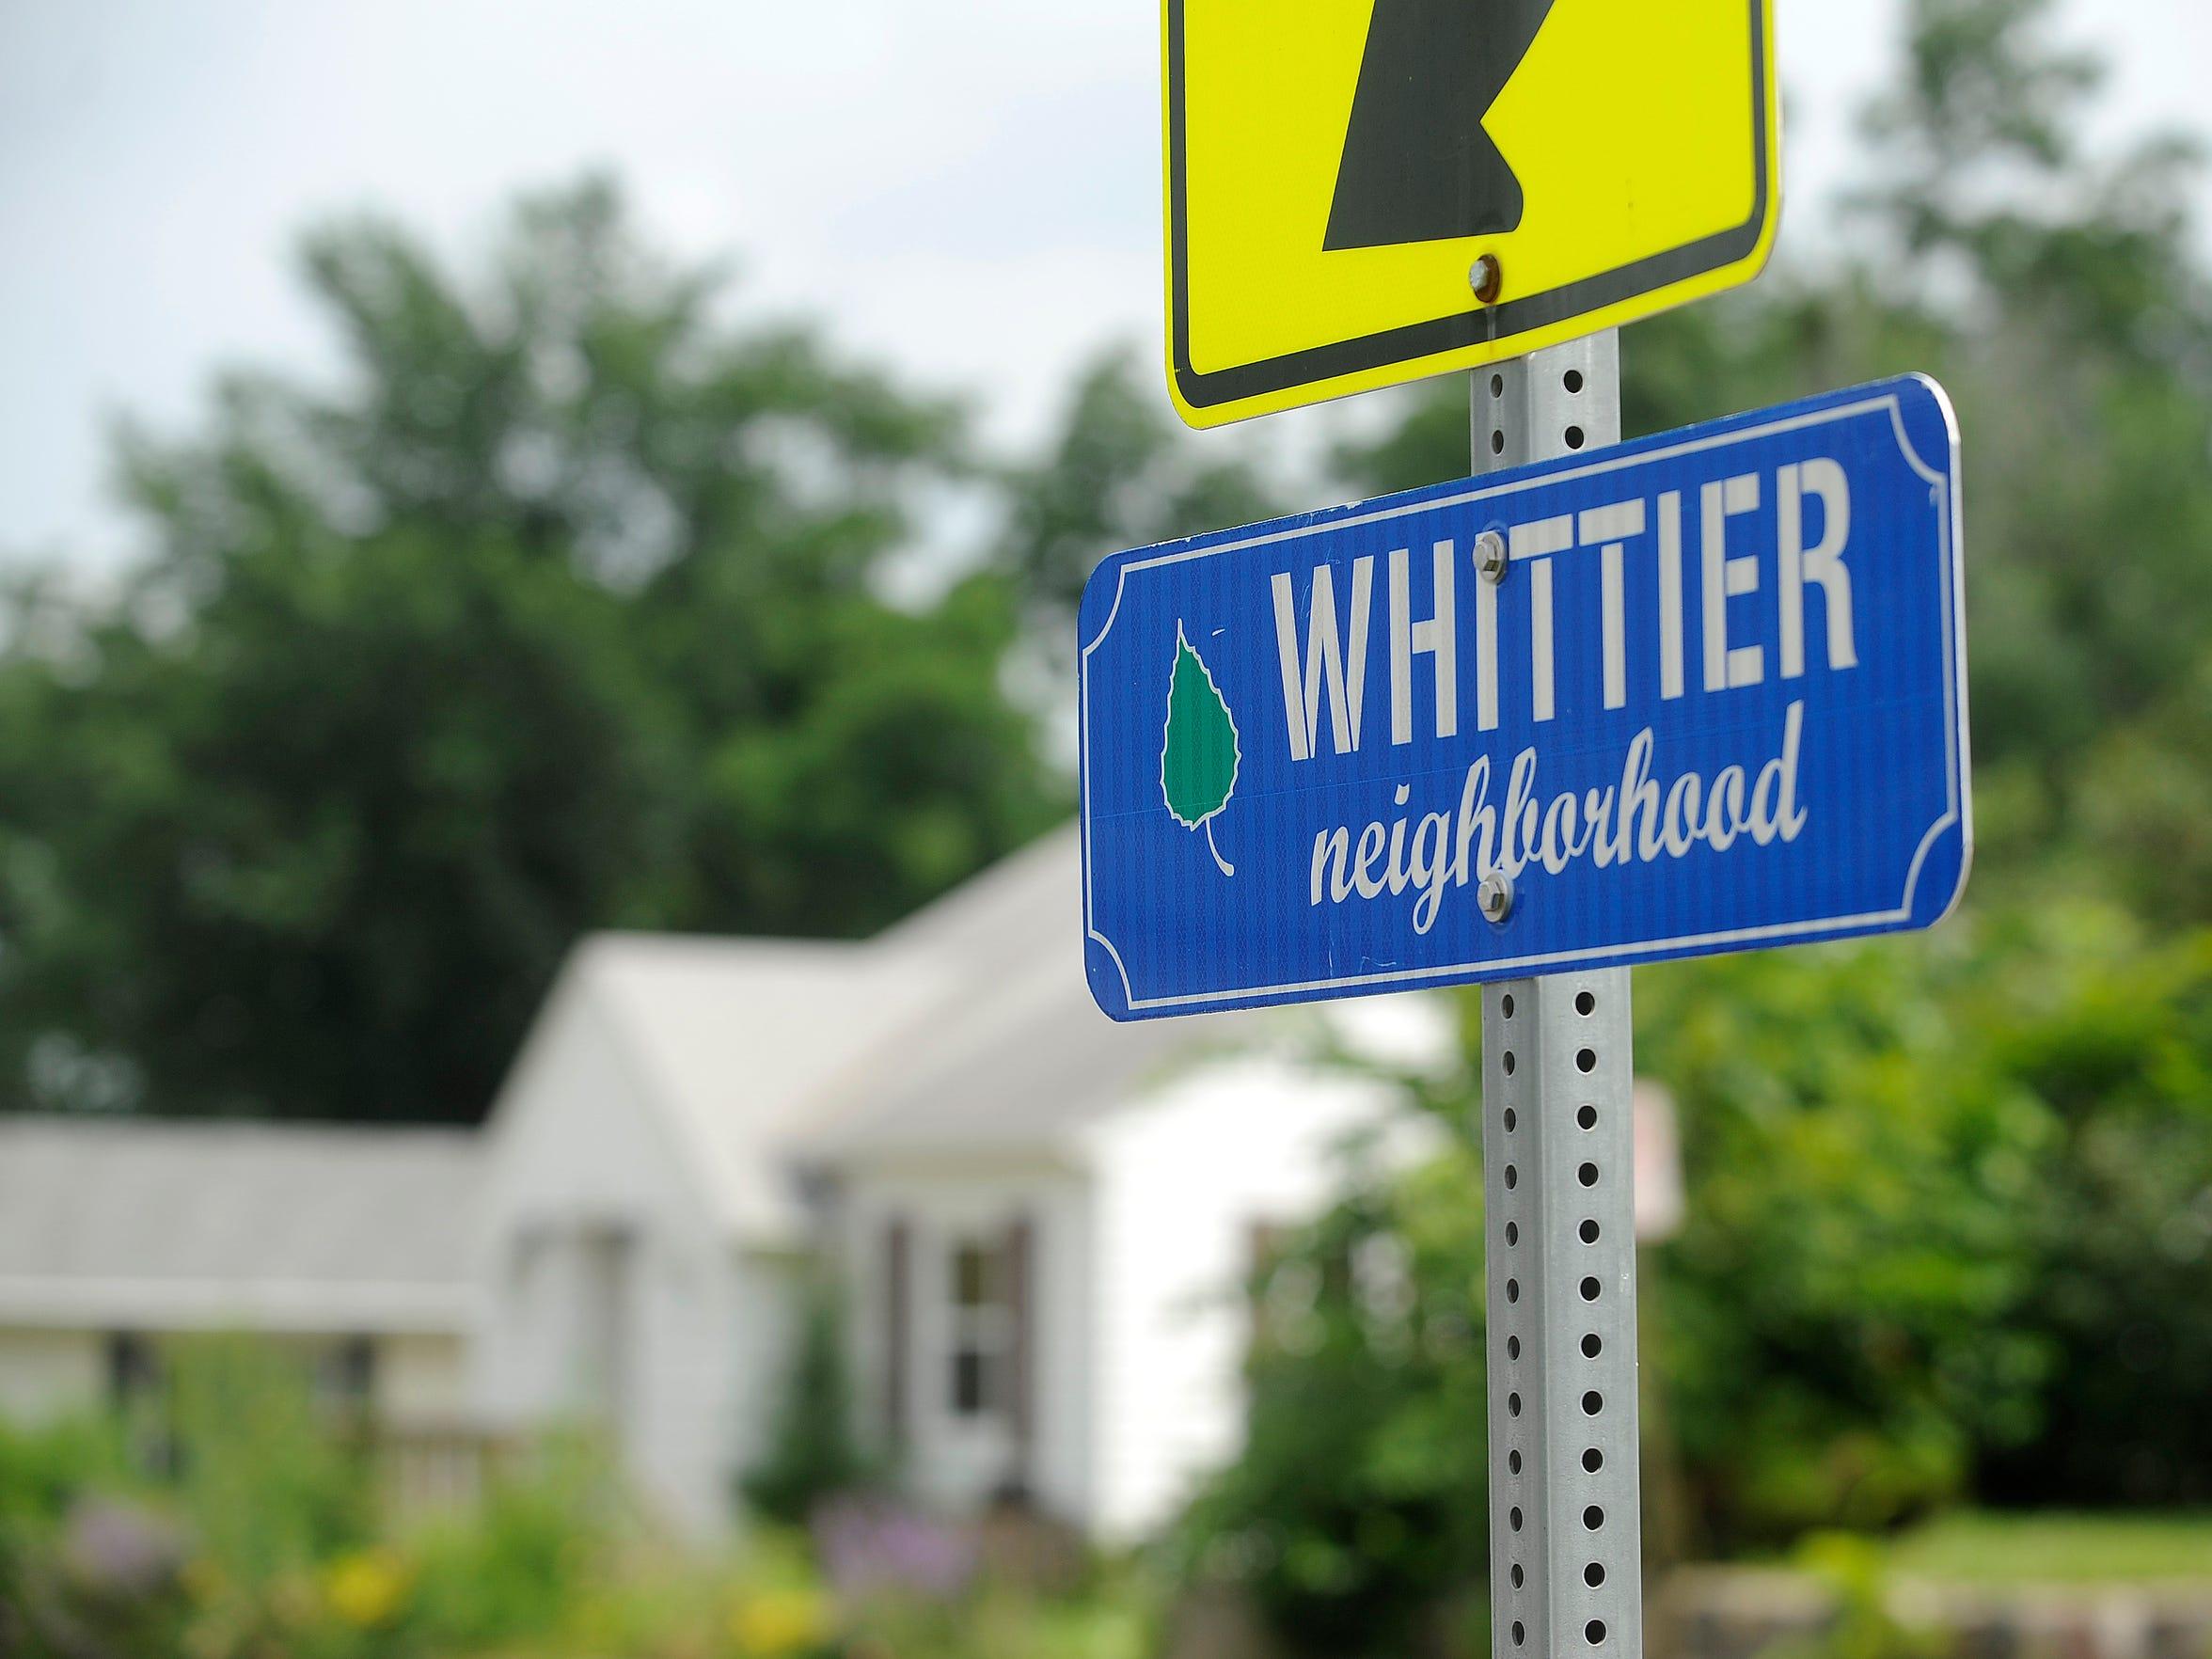 Whittier neighborhood in Sioux Falls, S.D., Thursday, July 9, 2015.